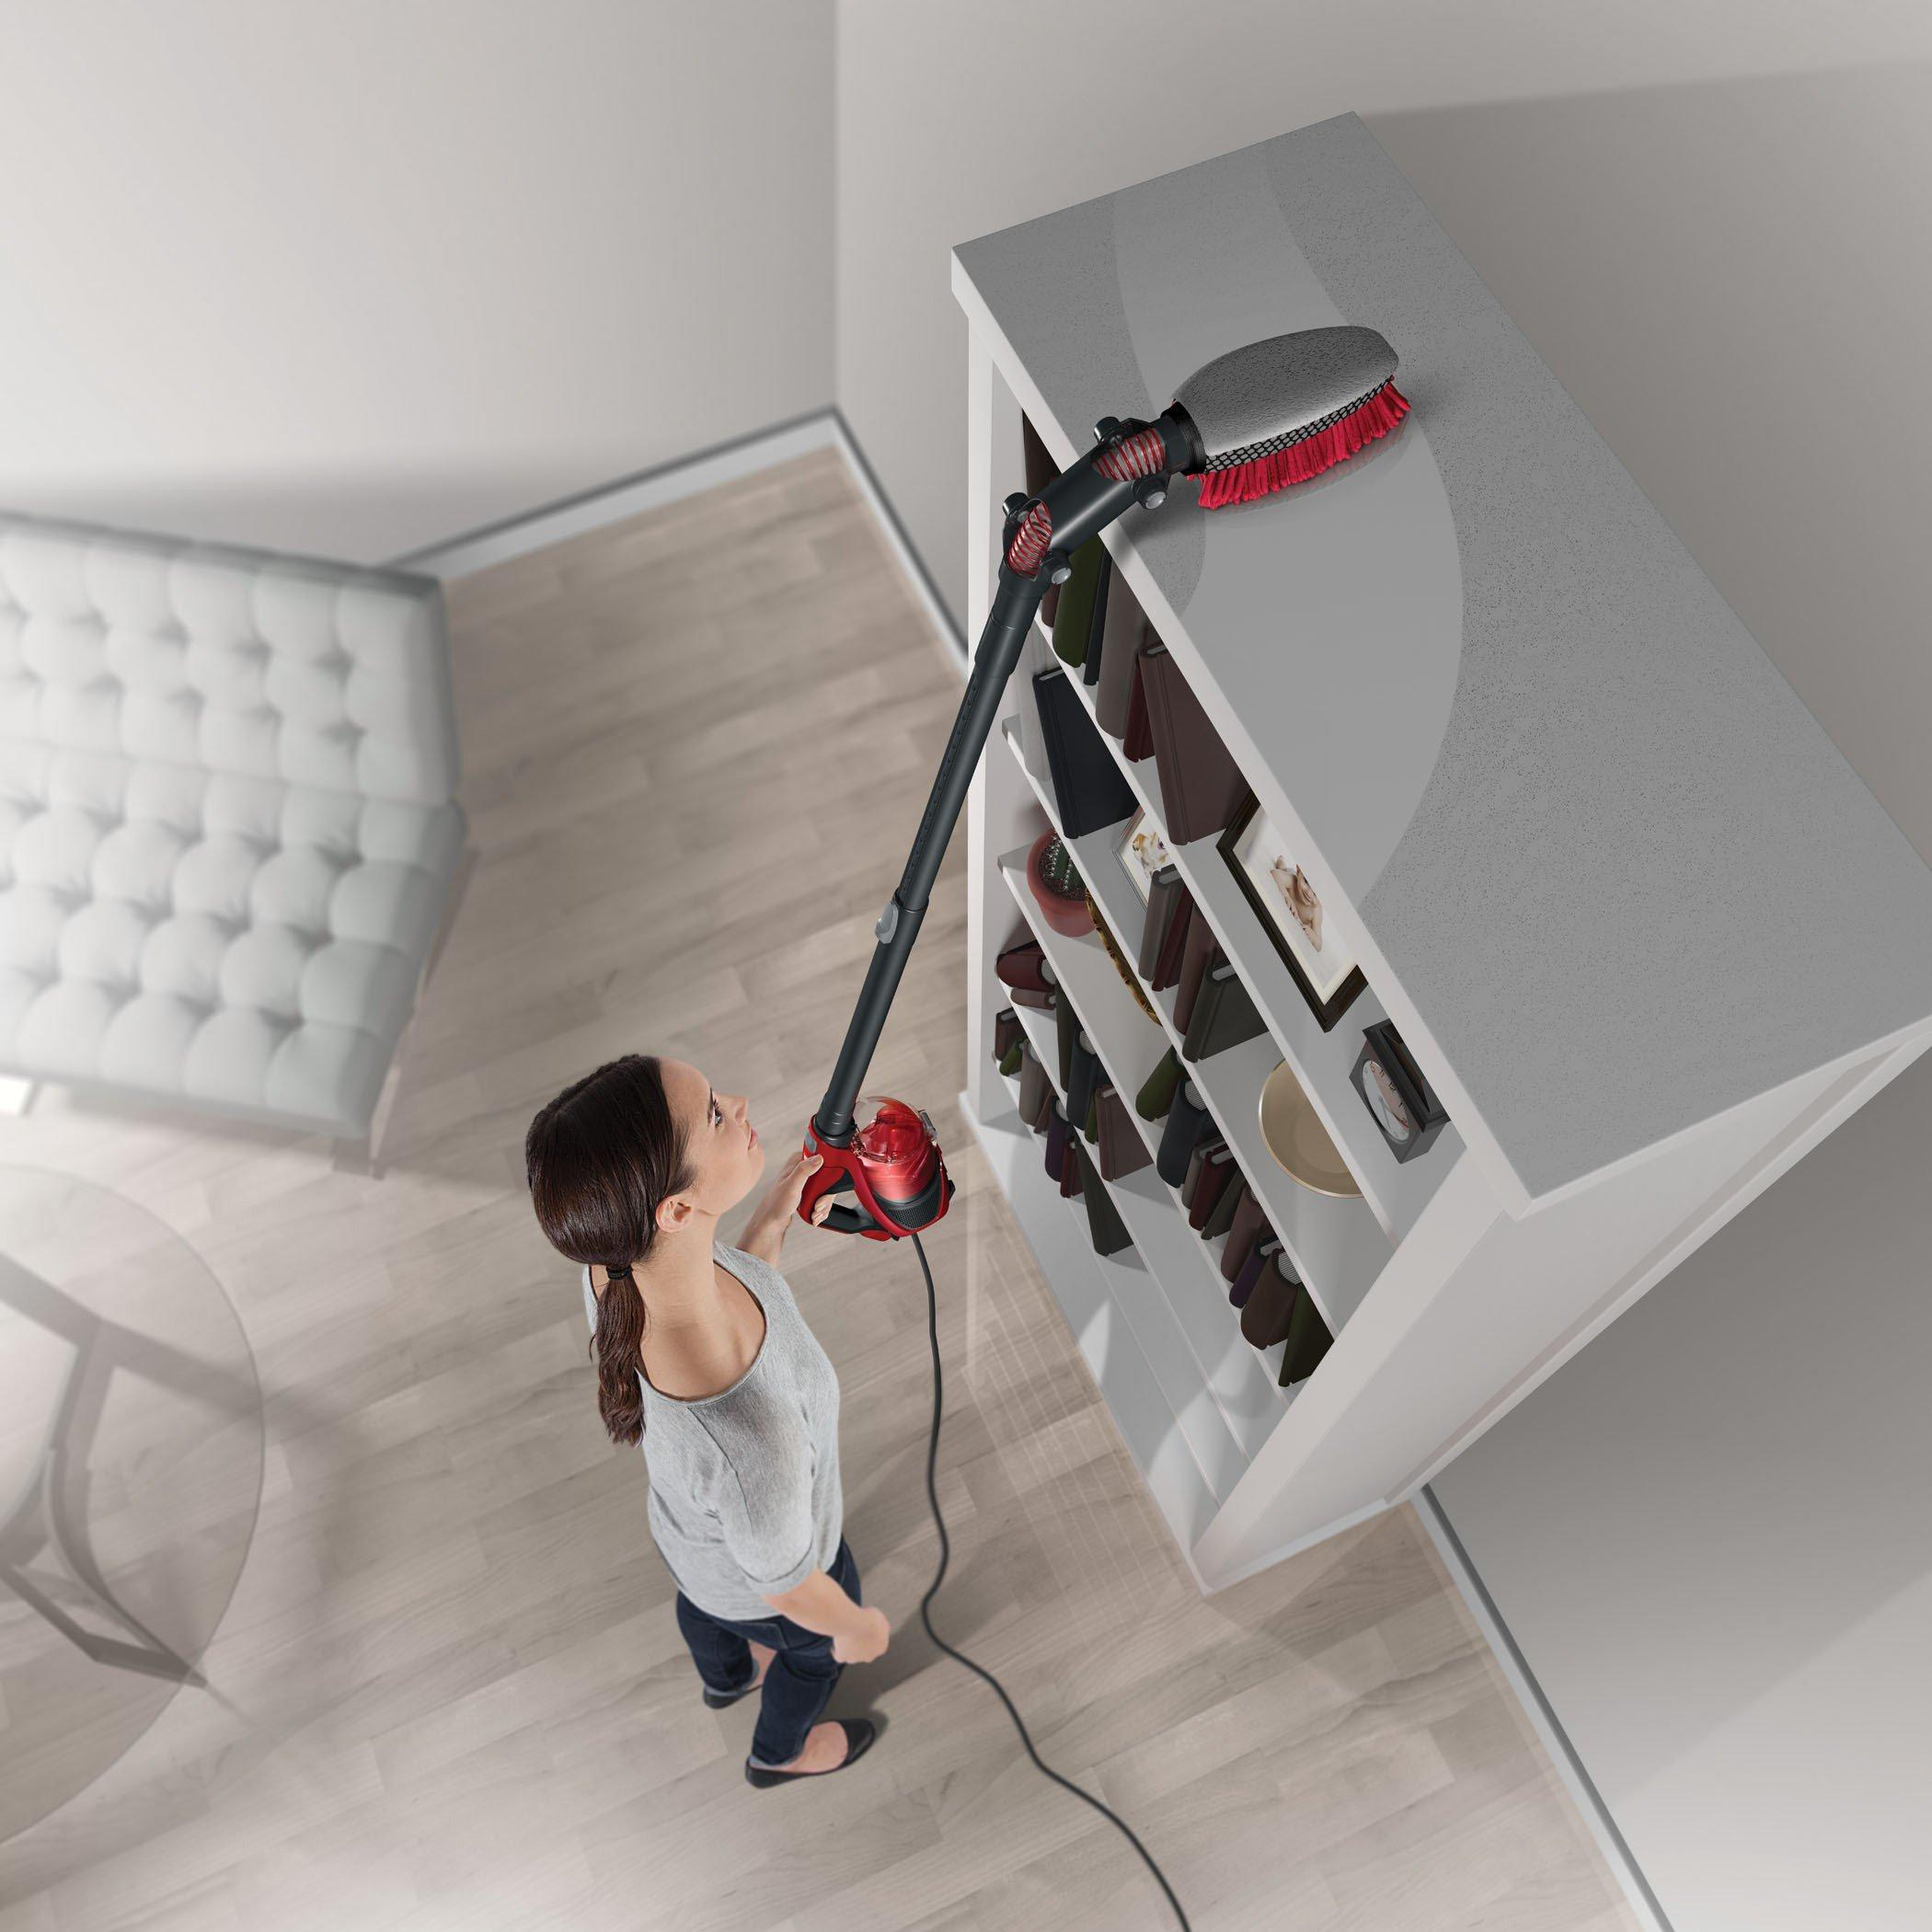 360° Reach Power Corded Stick Vacuum5